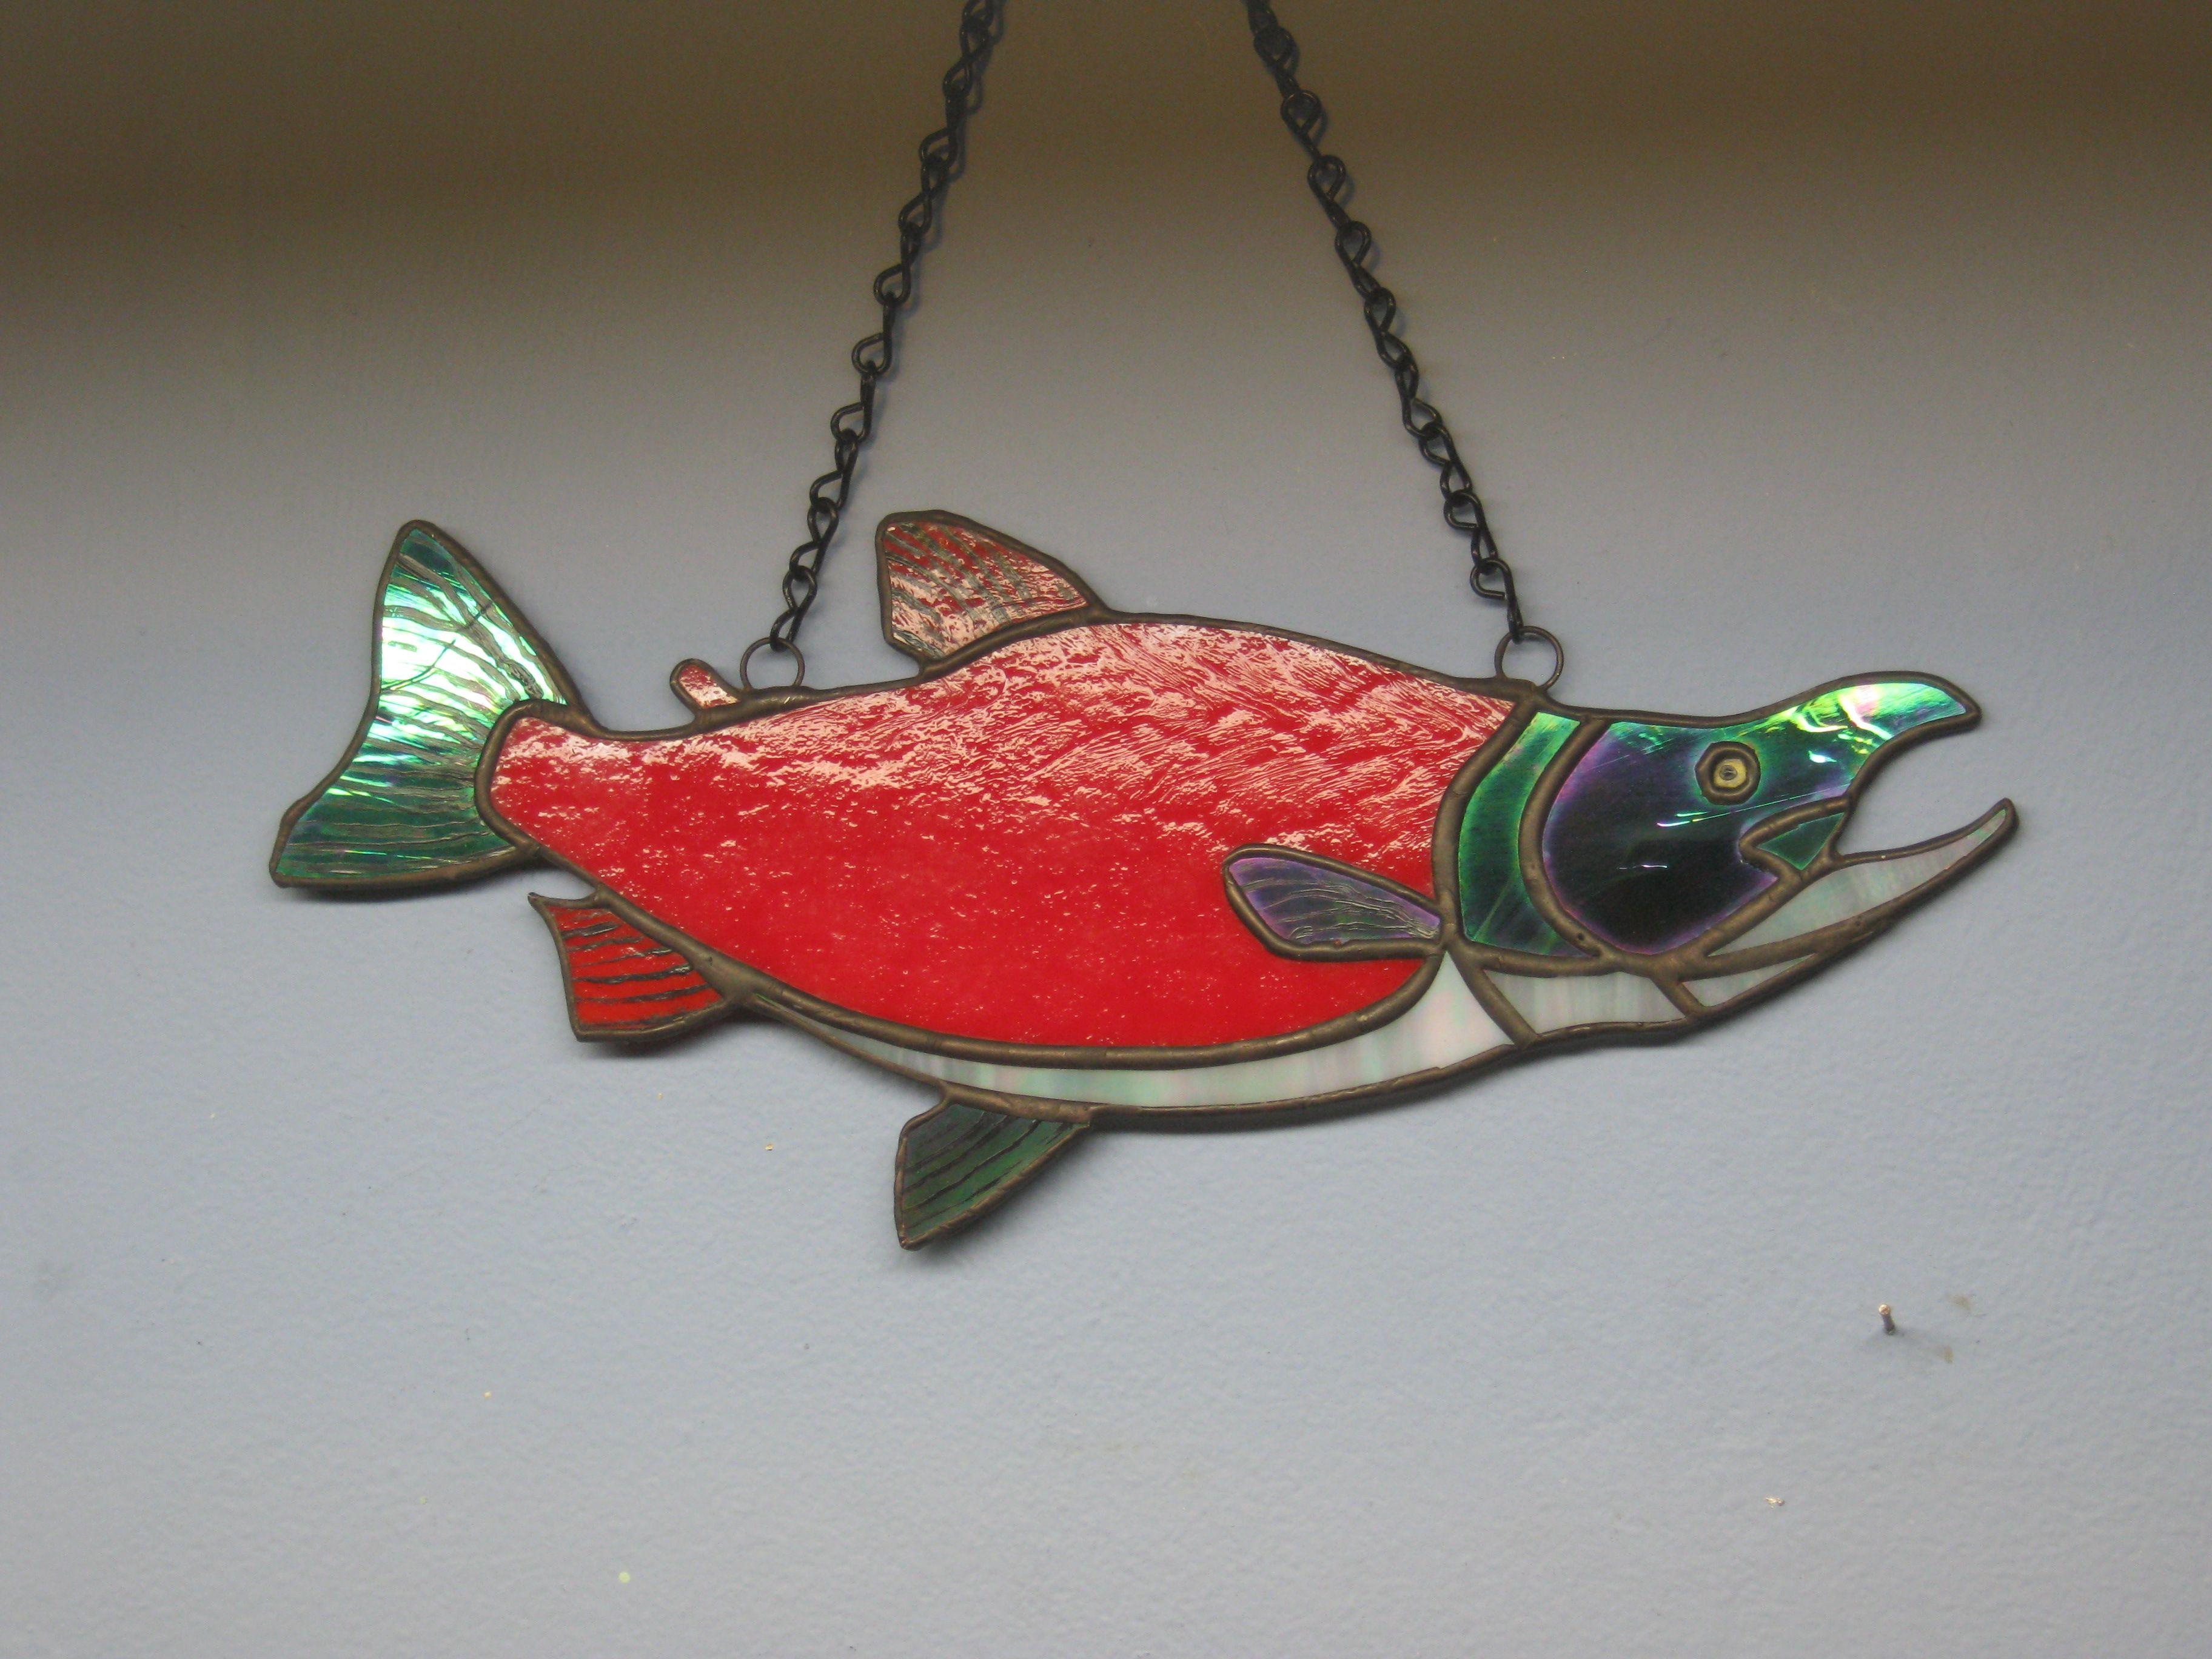 Stained Glass Kokanee Salmon (Land locked Sockeye Salmon) (6\